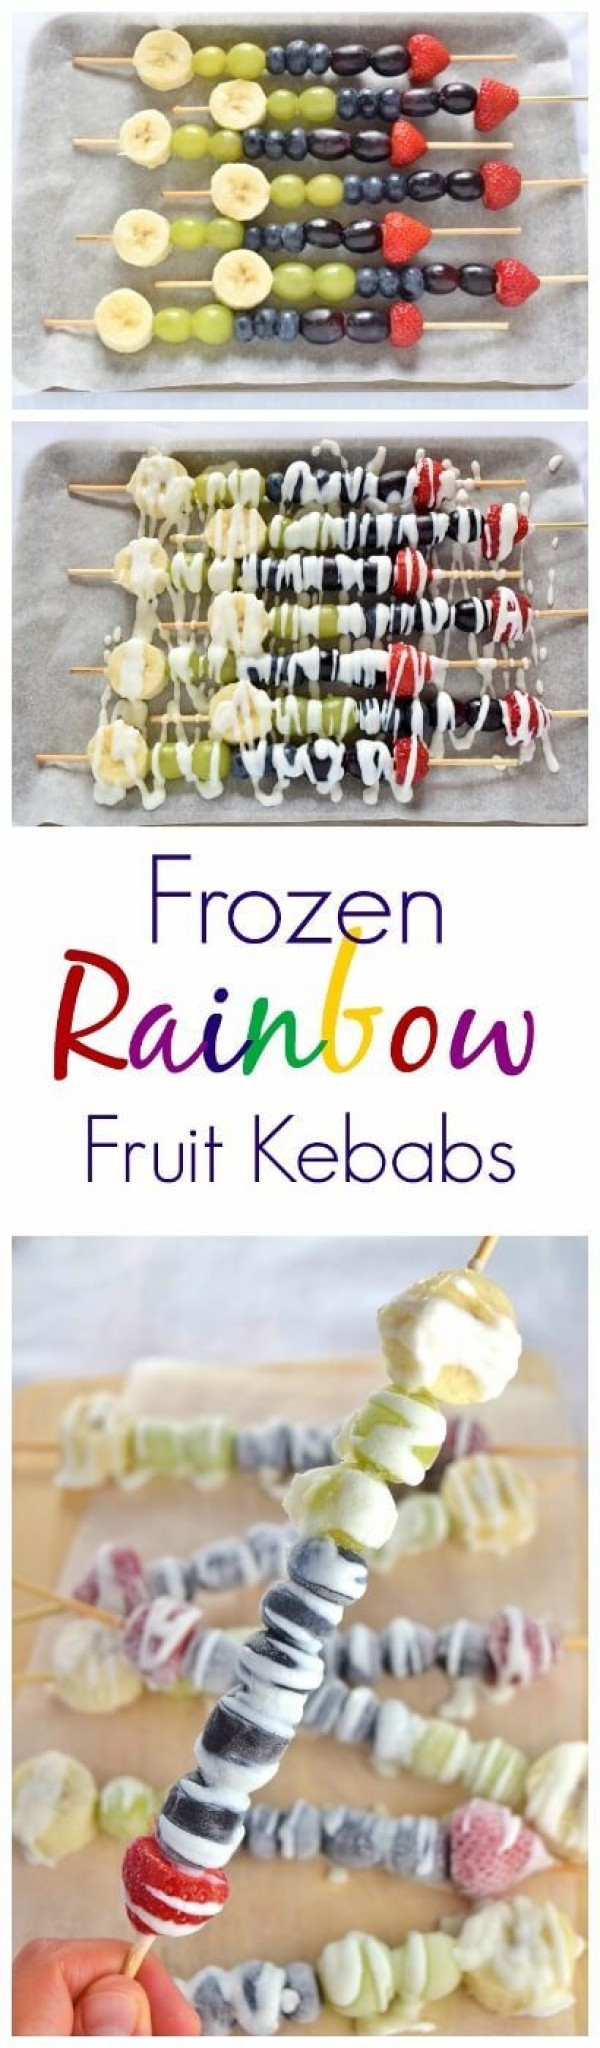 Get the recipe Frozen Rainbow Fruit Kebabs @recipes_to_go